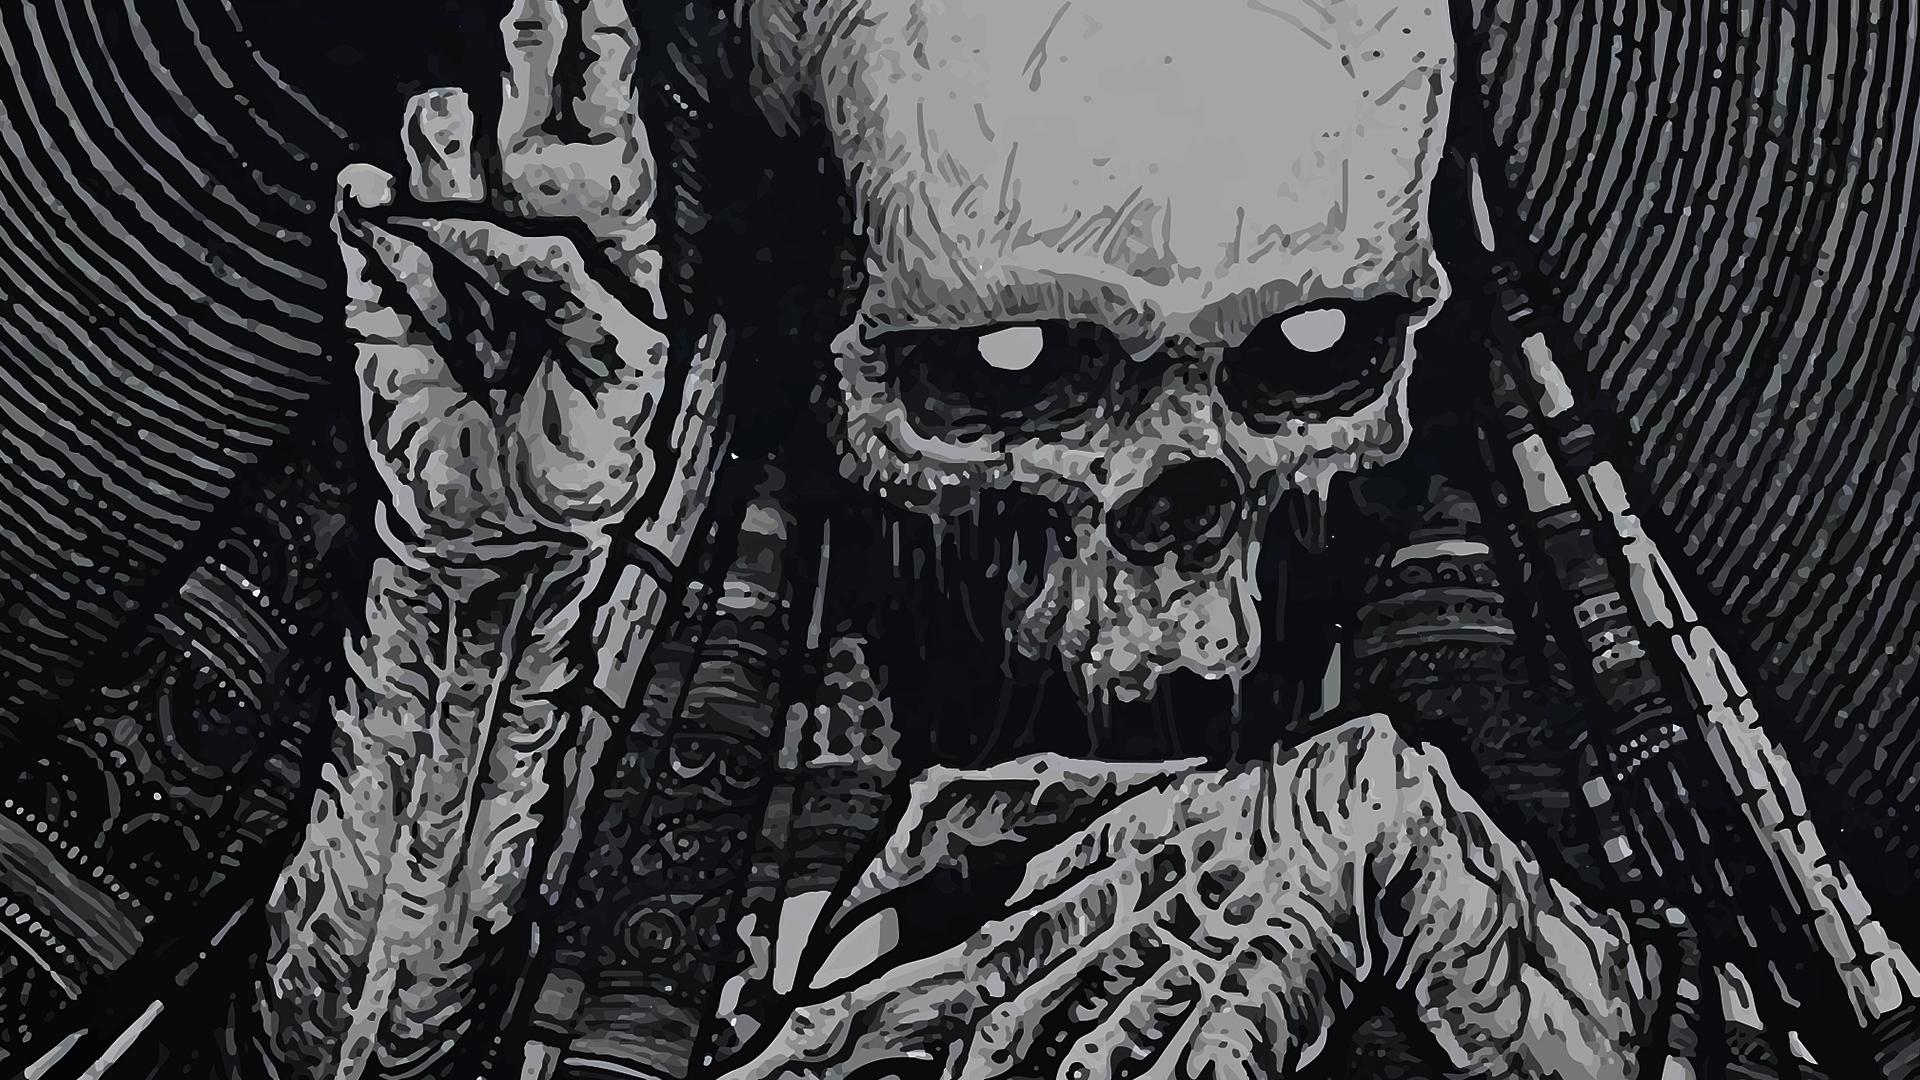 skeleton skull occult horror creepy spooky scary halloween wallpaper